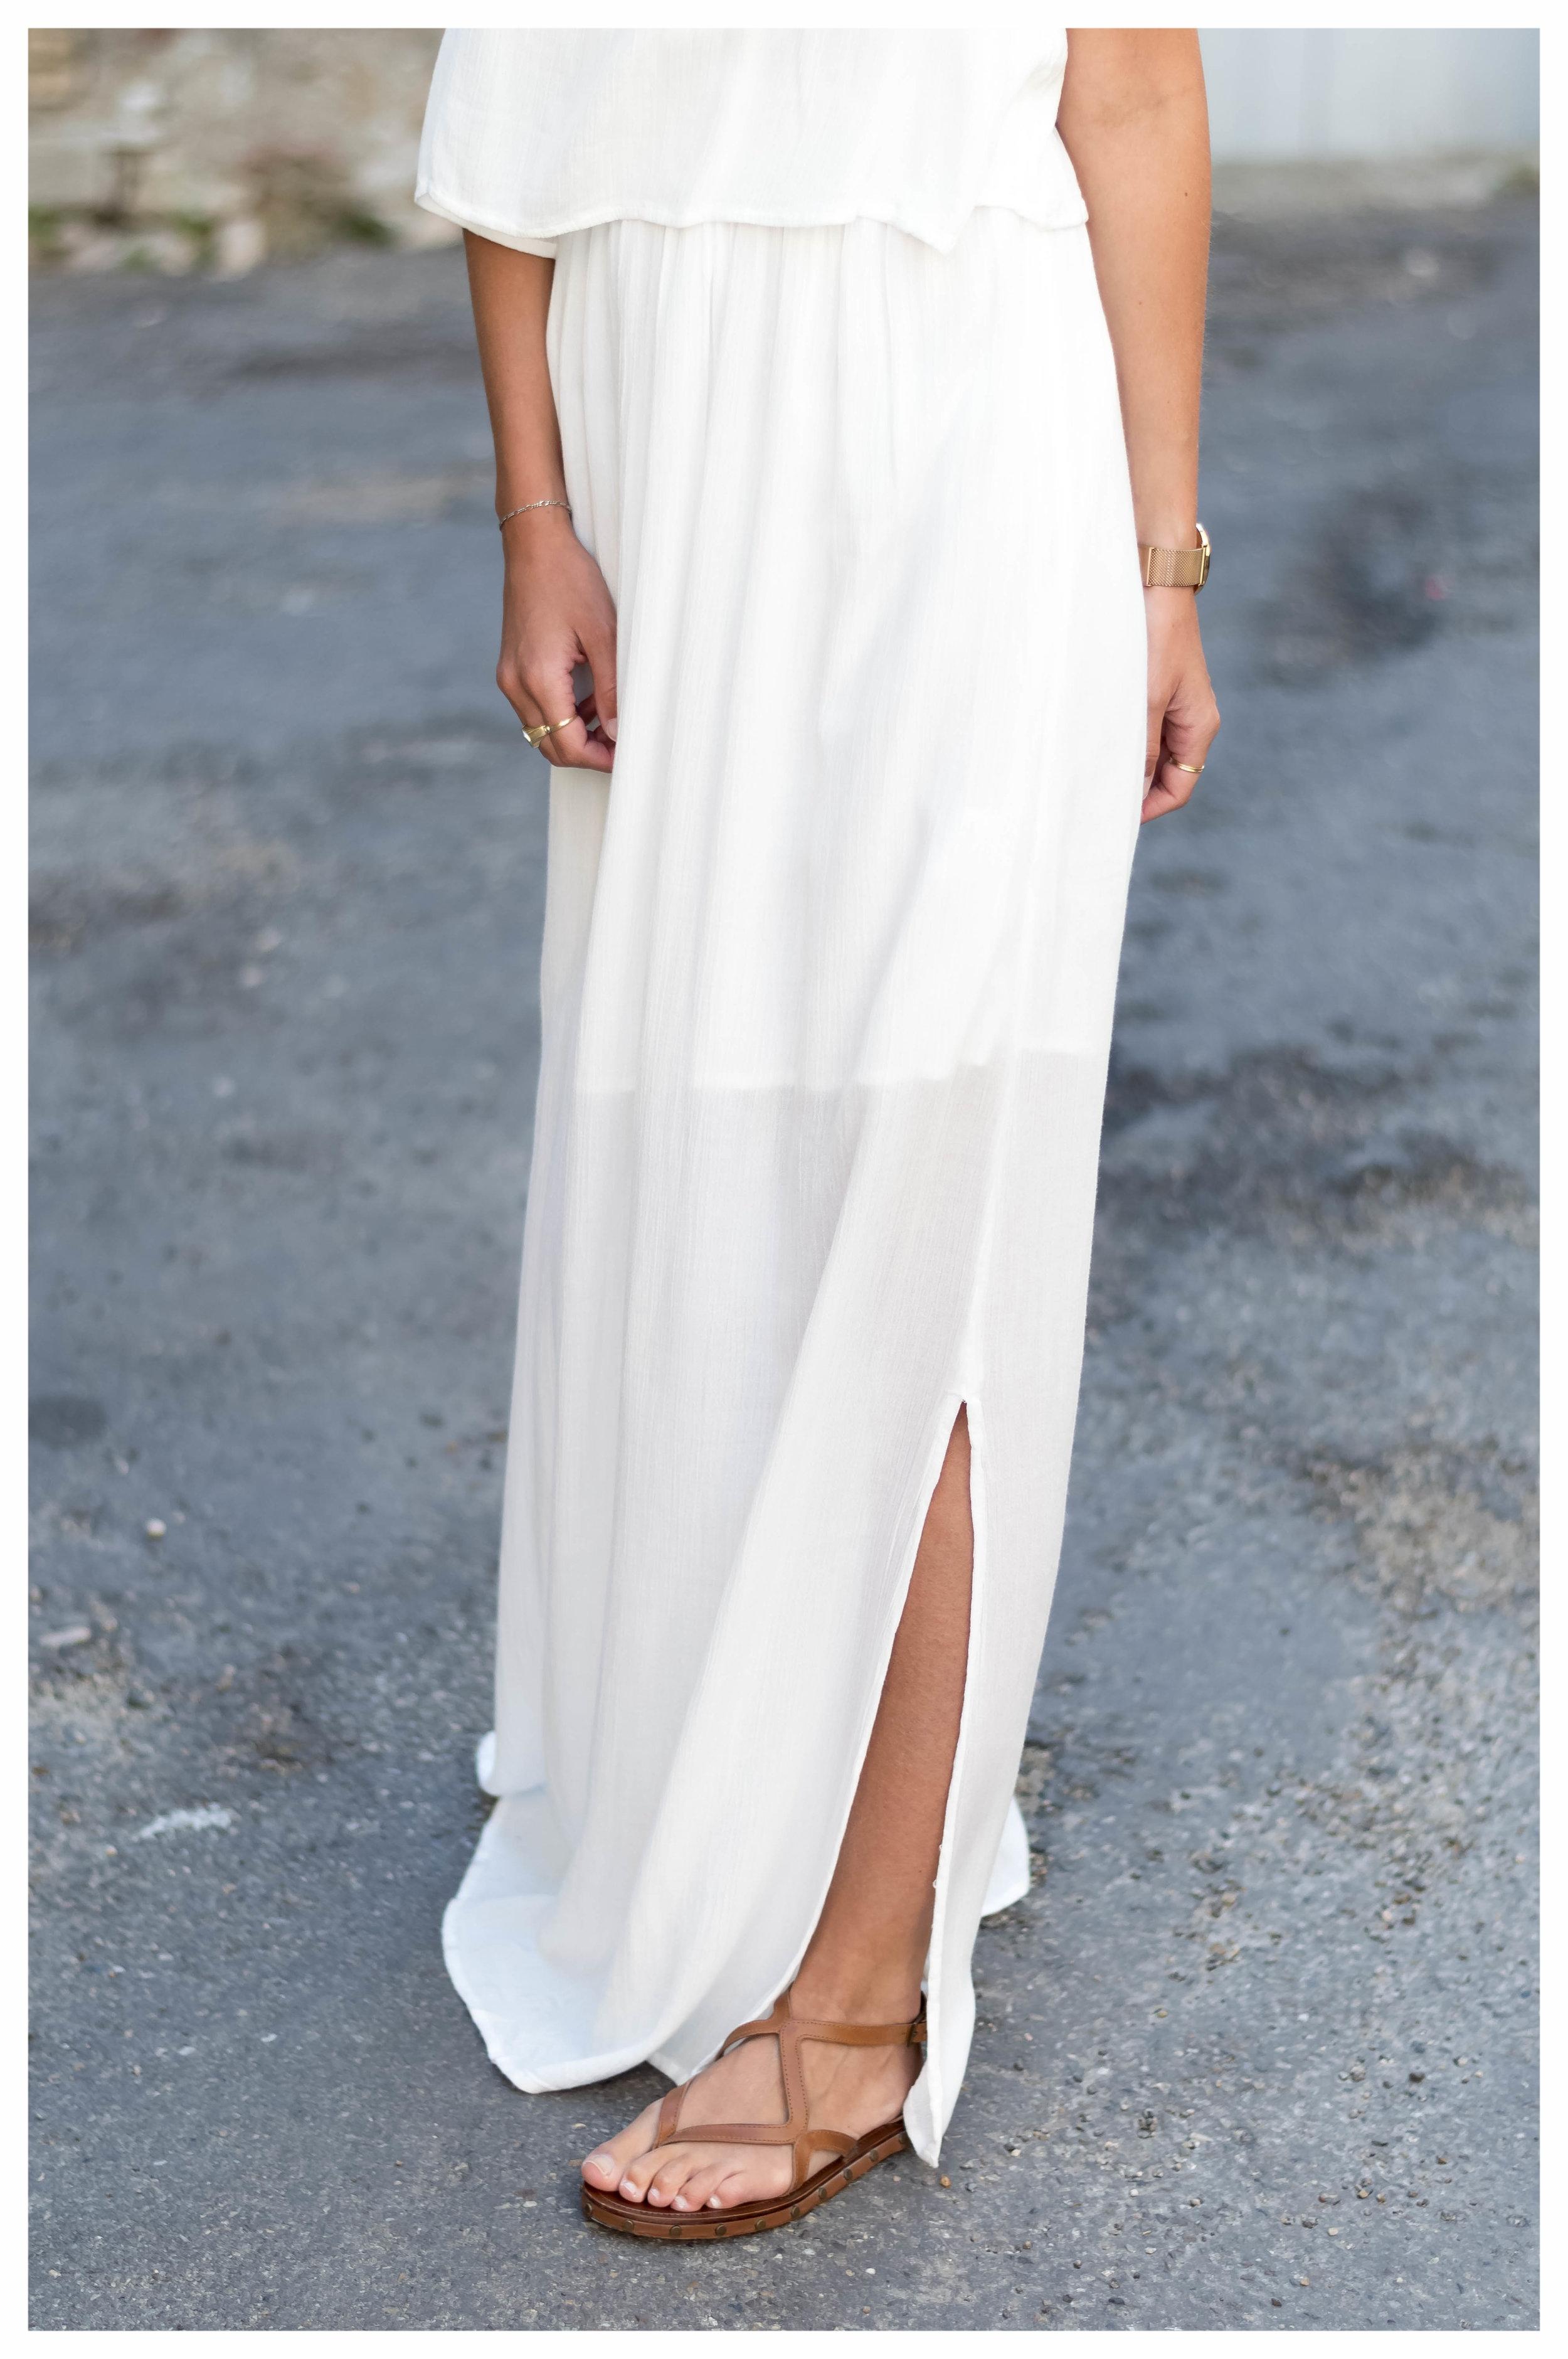 White Dress - OSIARAH.COM (14 sur 16).jpg